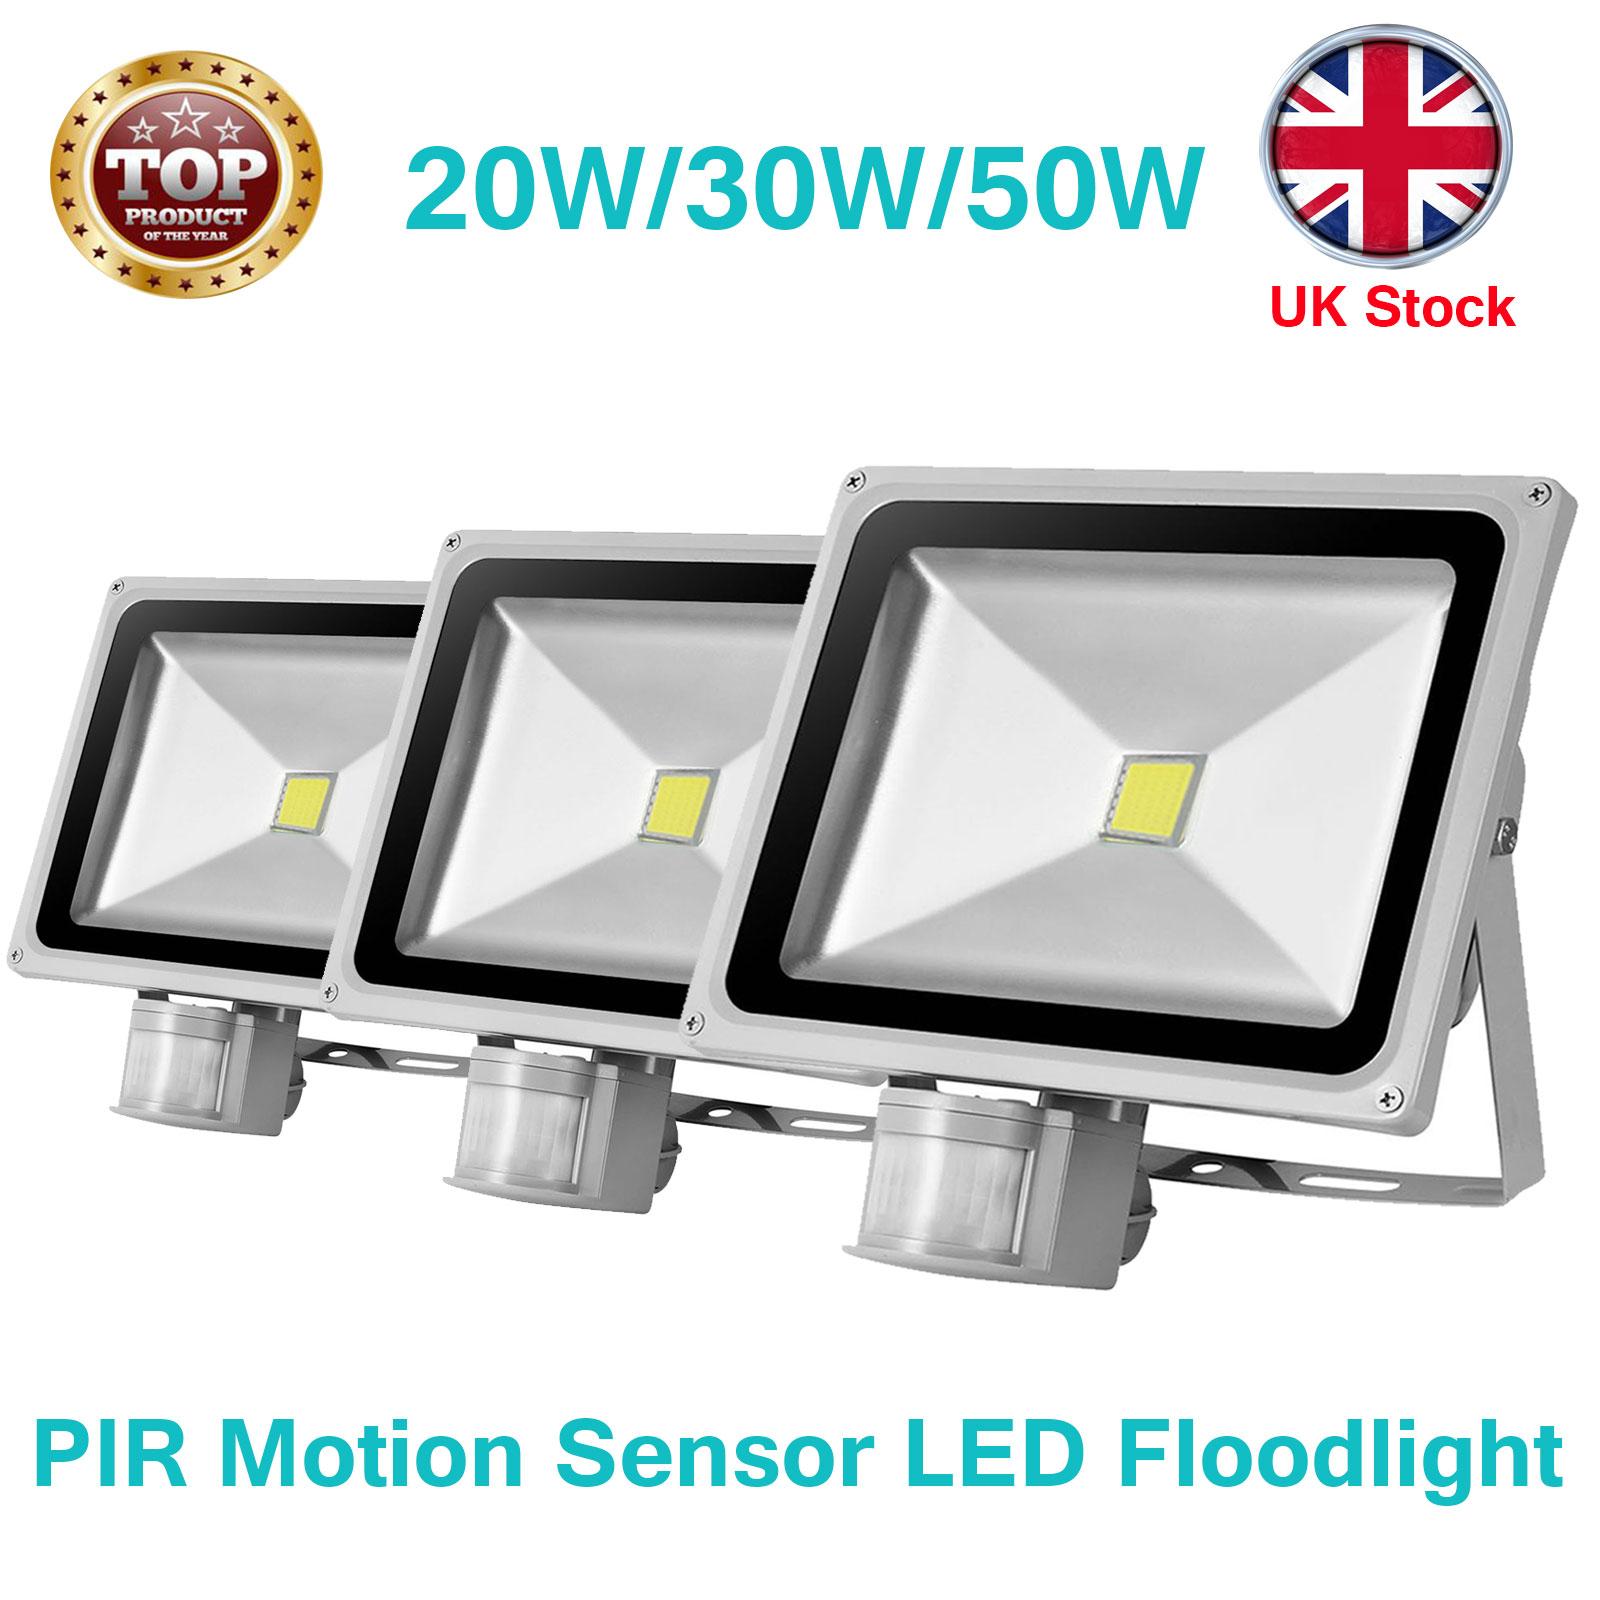 Details About 20w 30w 50w 100w Led Flood Light Pir Motion Sensor Outdoor Security Uk